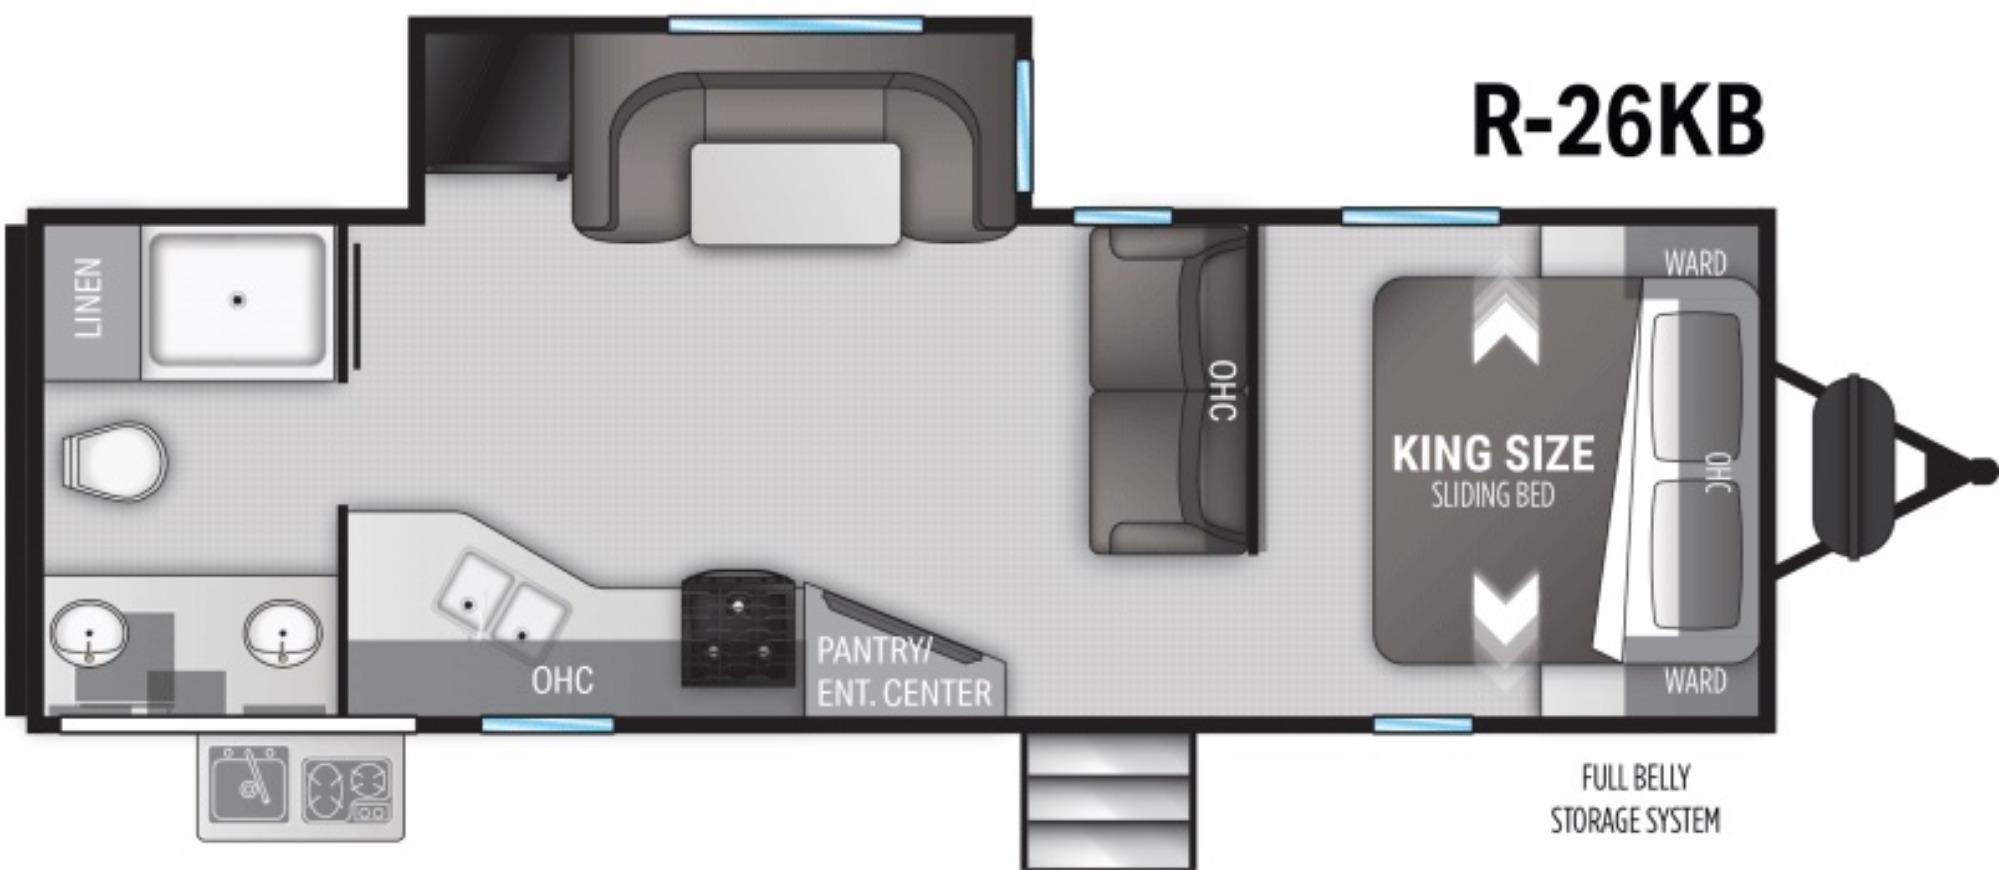 View Floor Plan for 2022 CRUISER RV RADIANCE 26KB